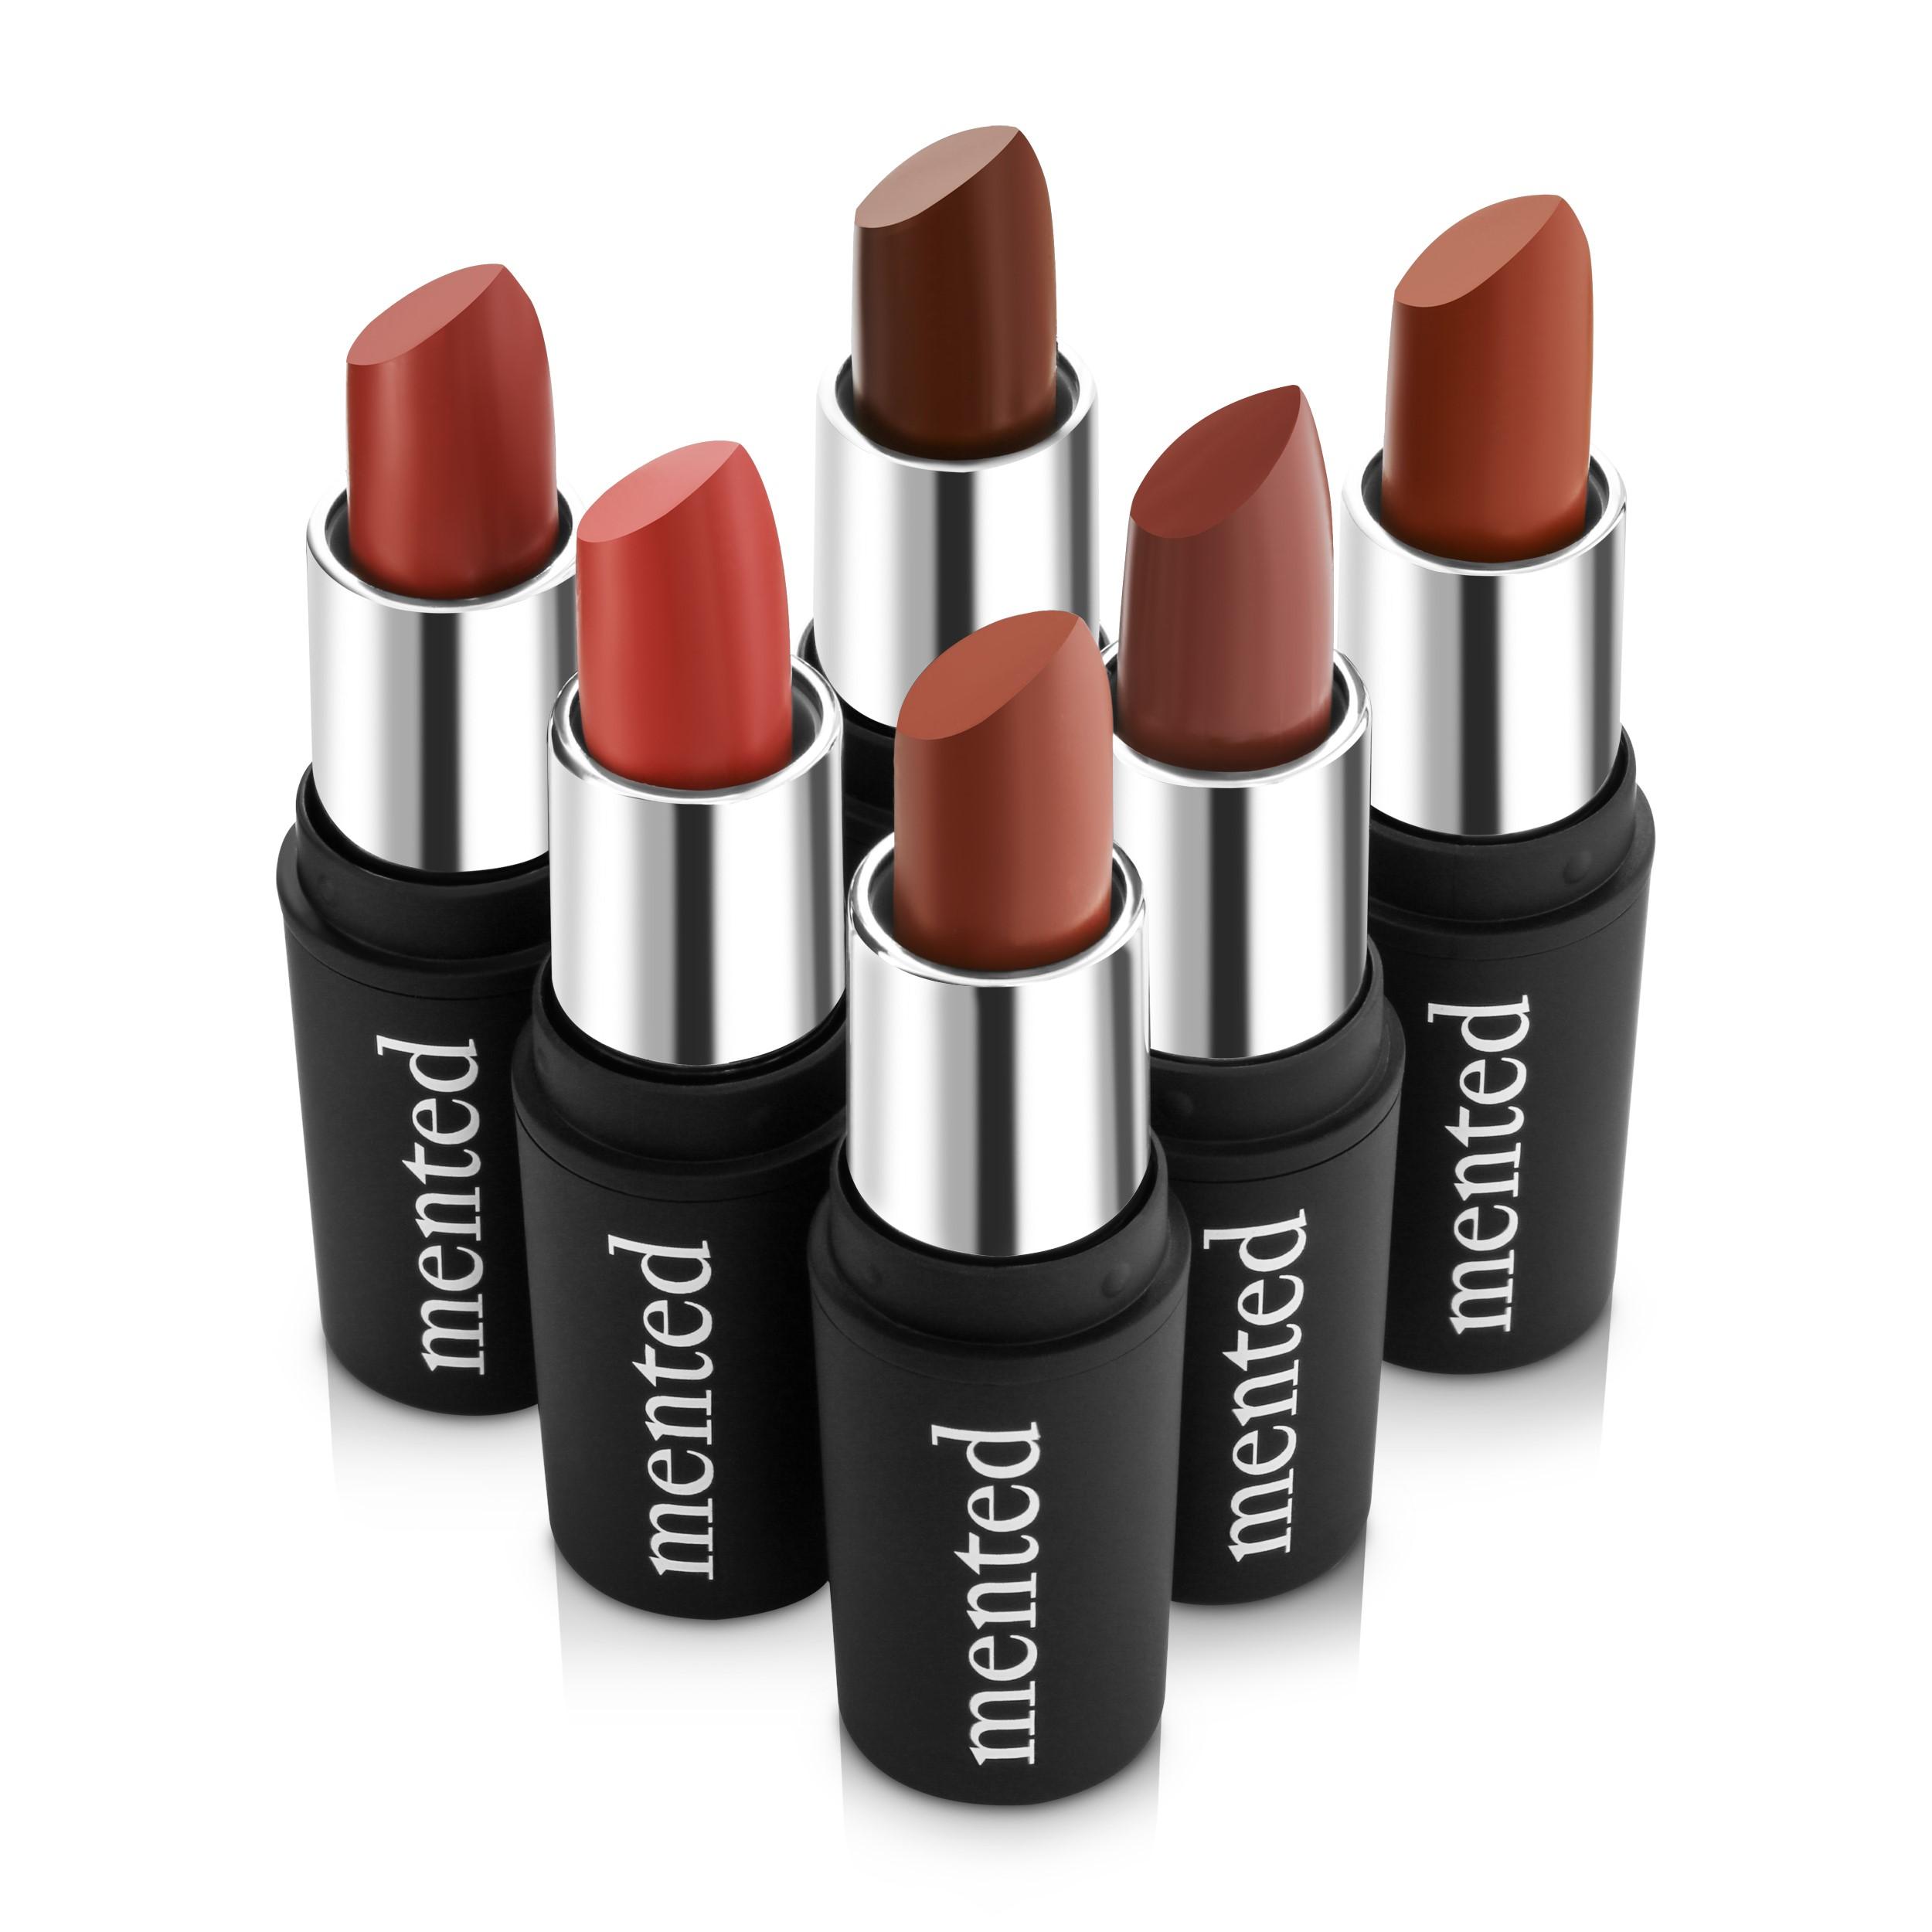 Image: Mented Cosmetics Lipstick 3